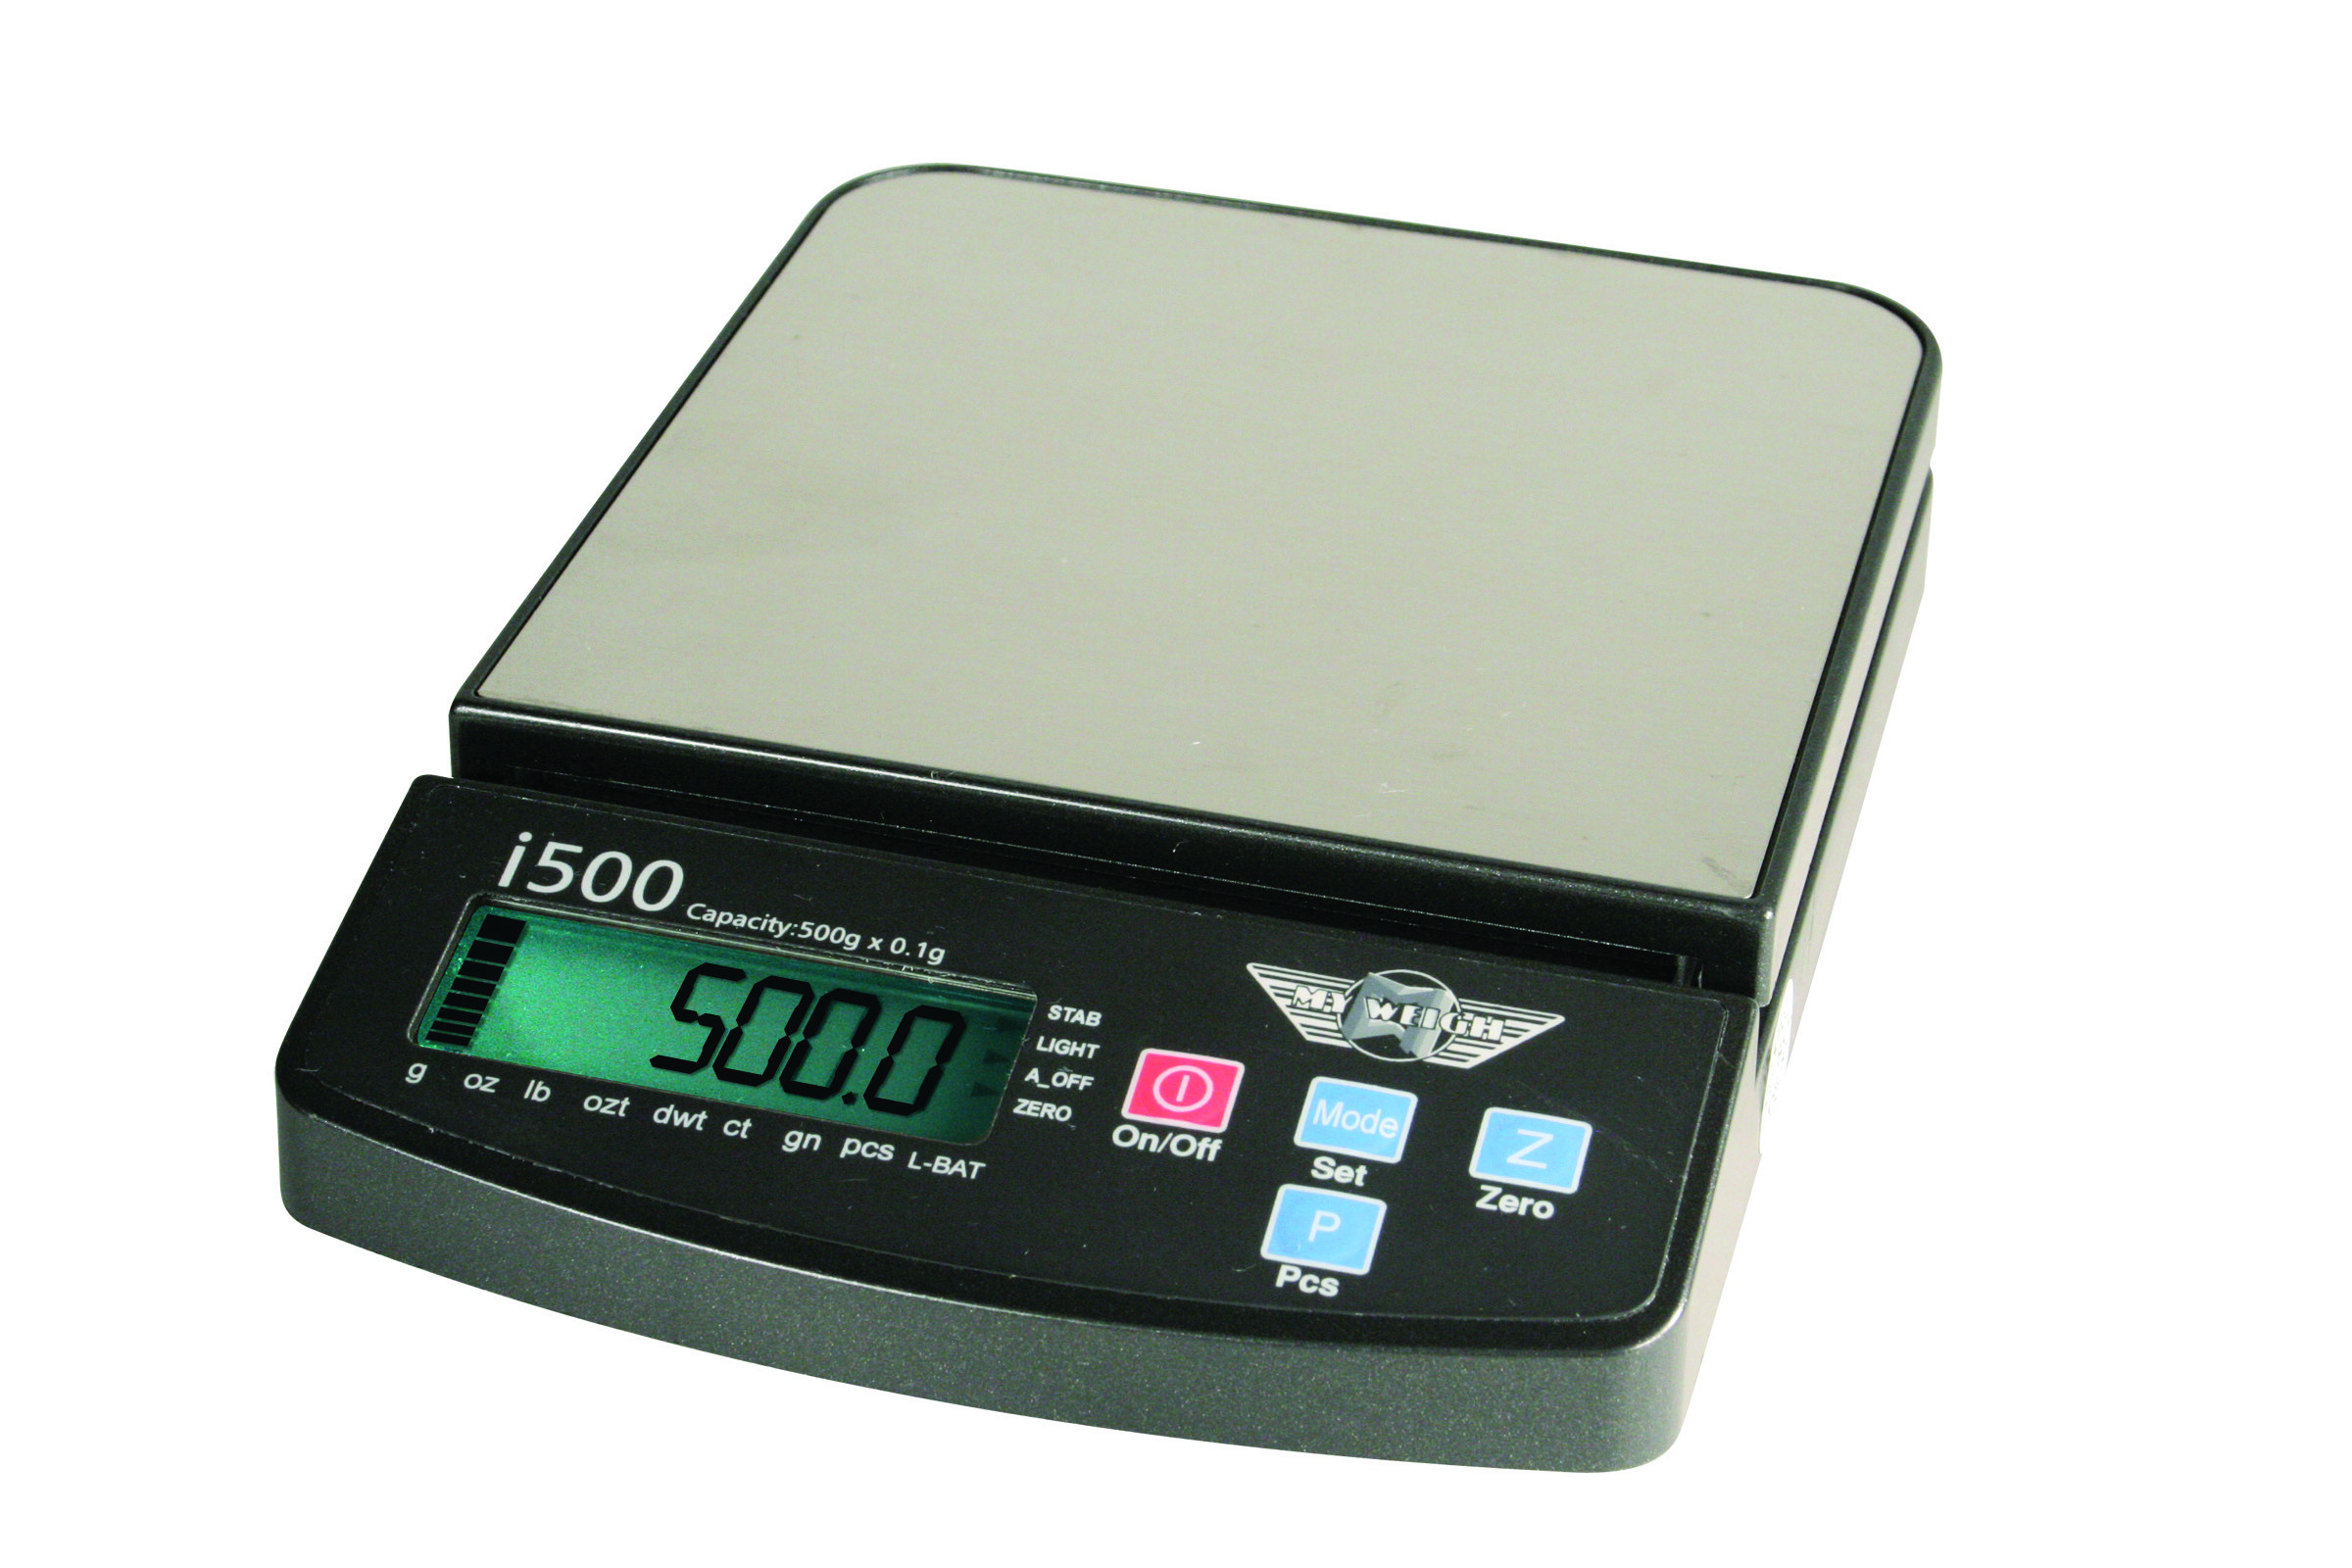 My Weigh iBalance 500 Vejeplade (145 x 145 mm) (500 gr. x 0.1 gr.)